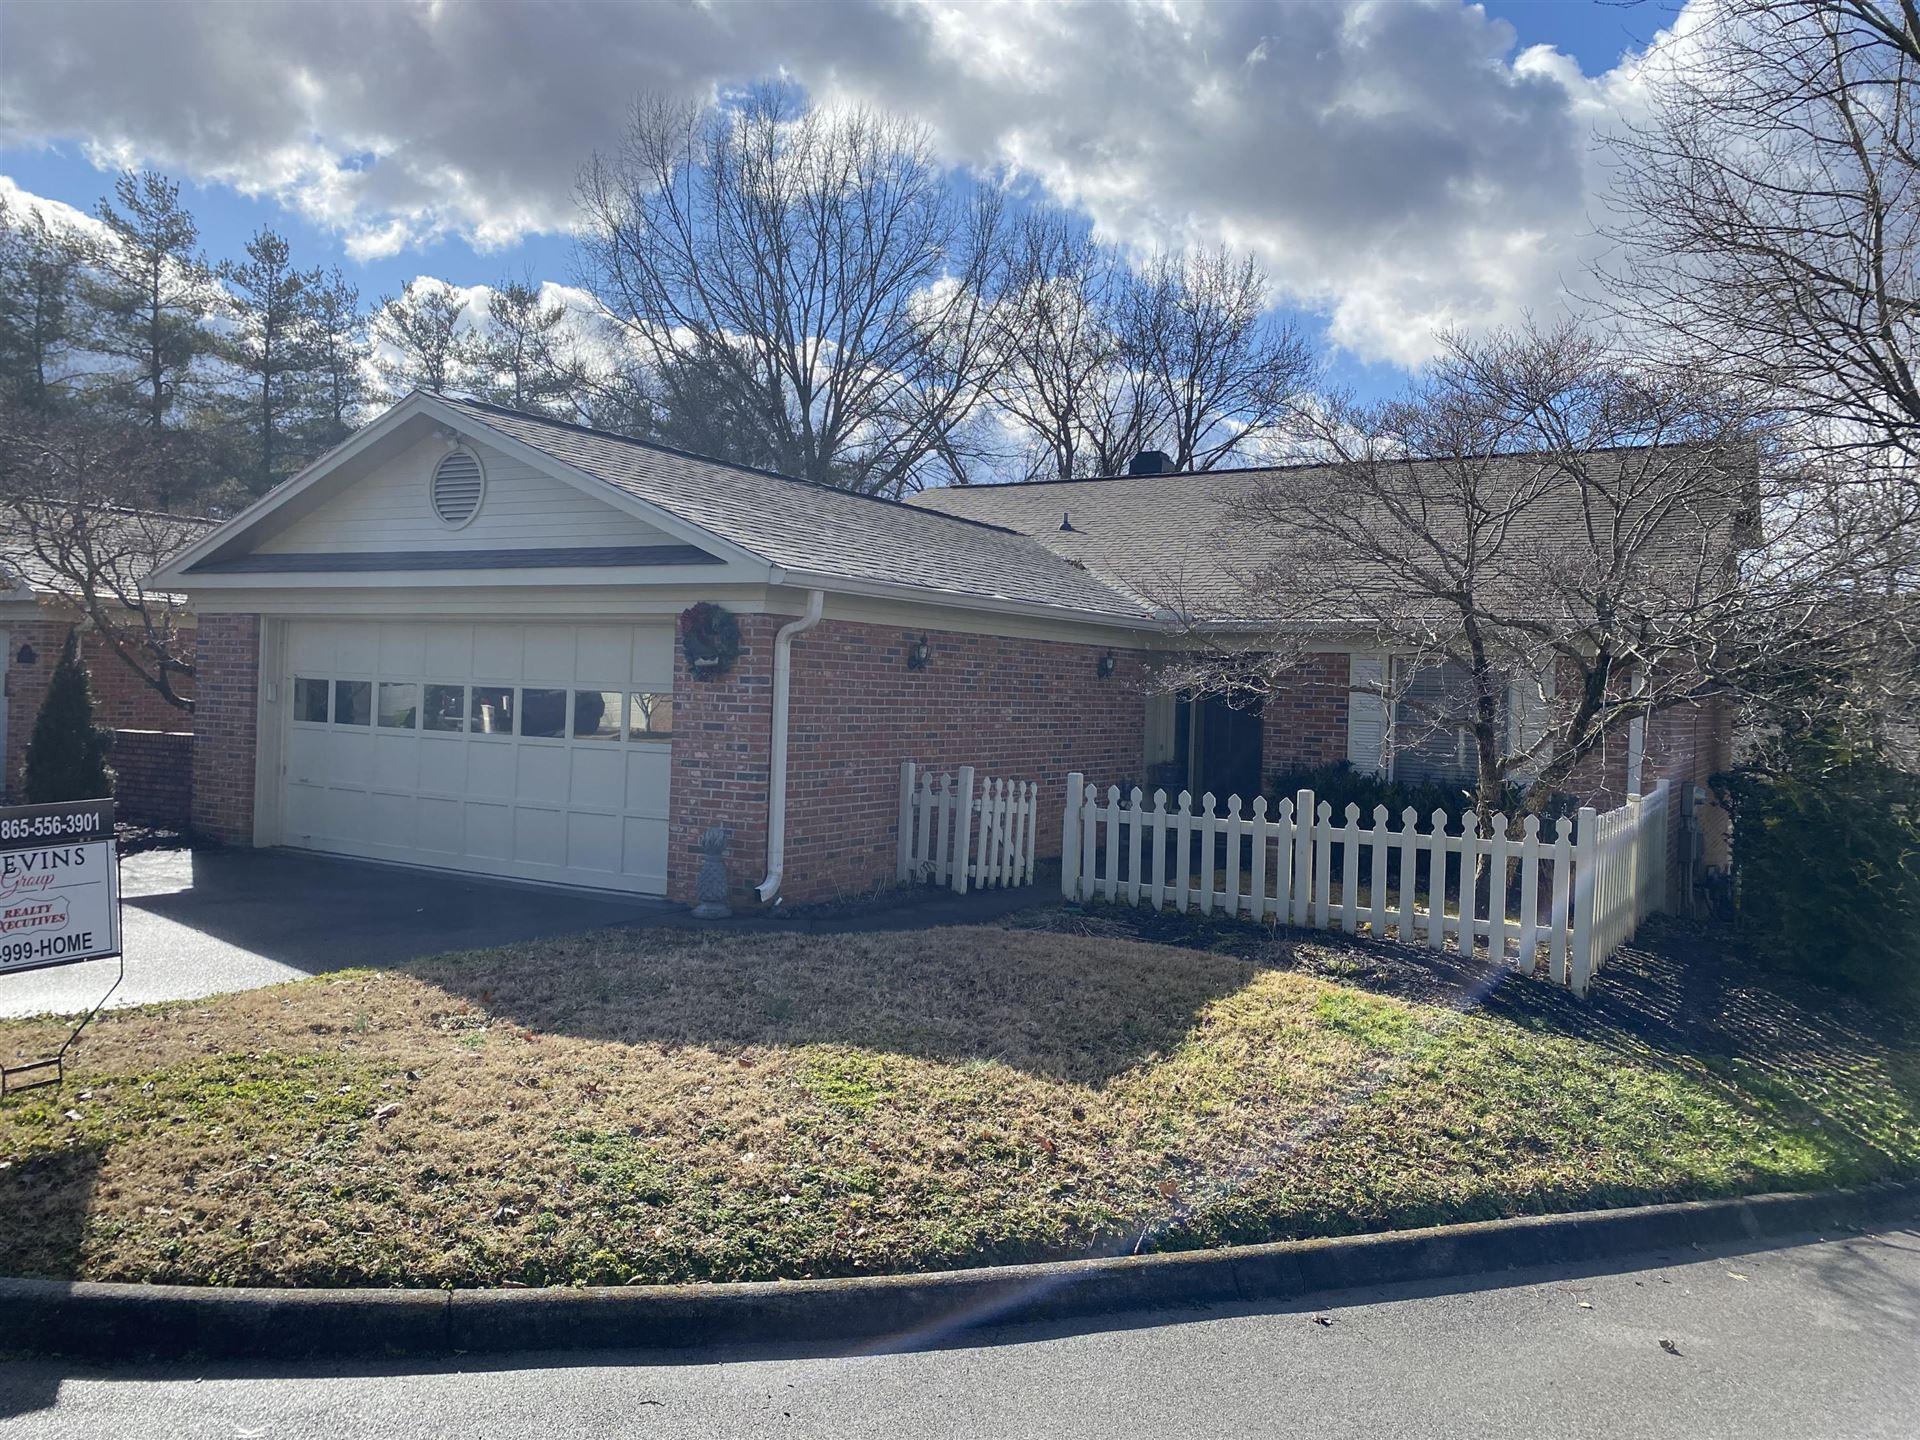 Photo of 801 Prestwick Drive, Maryville, TN 37803 (MLS # 1140095)